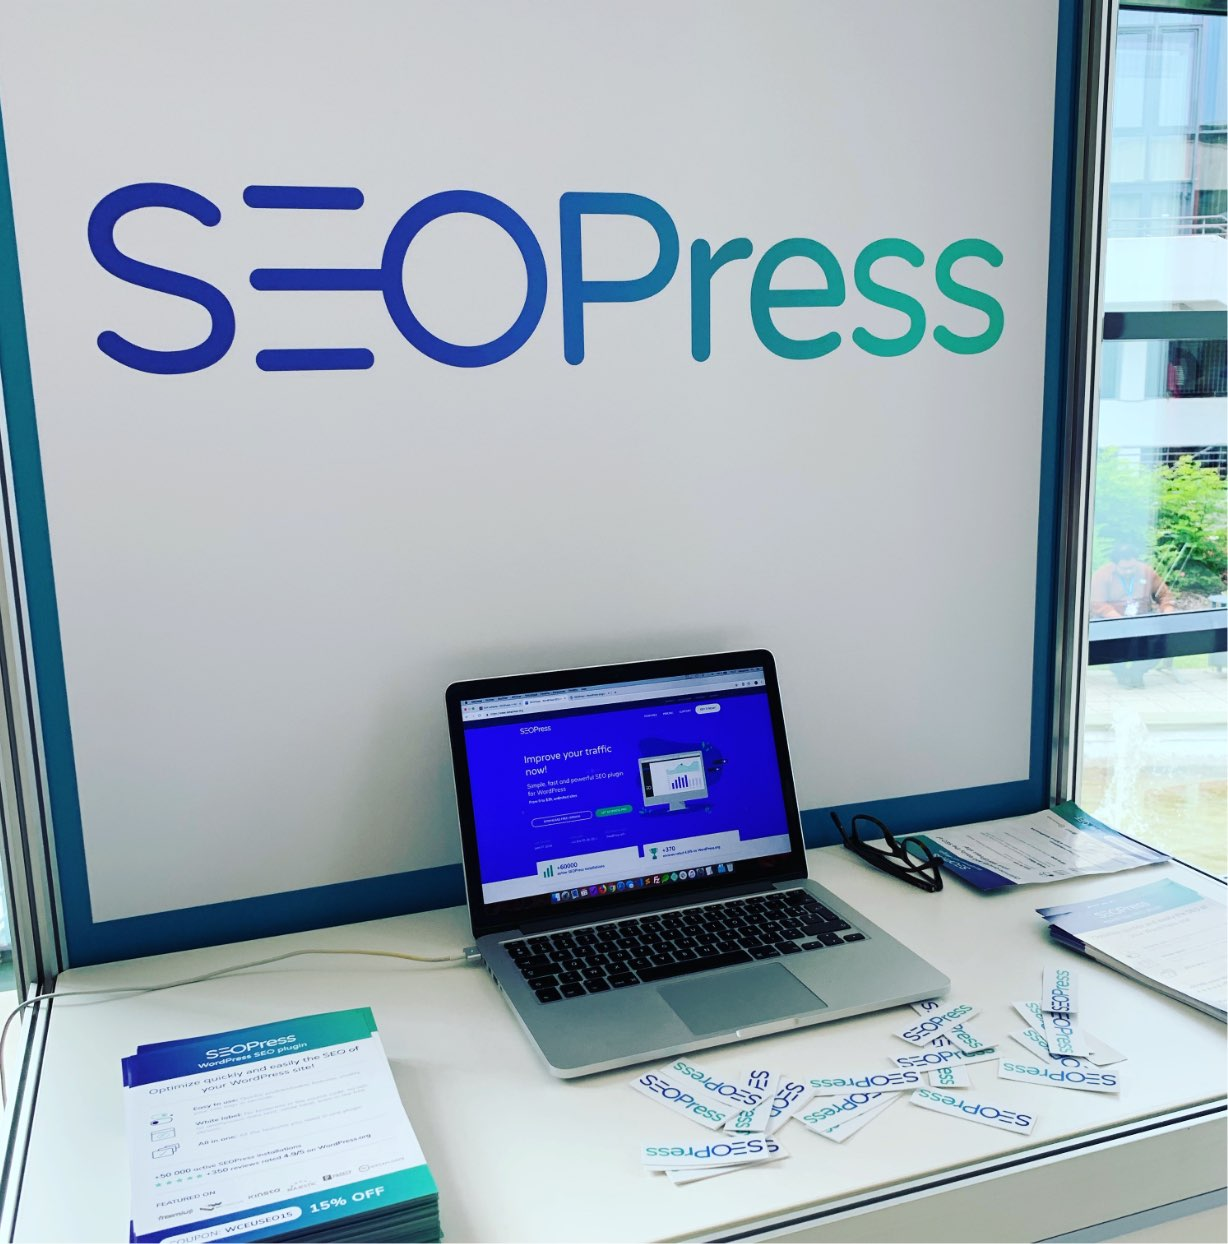 SEOPress WordCamp Europe - Berlin